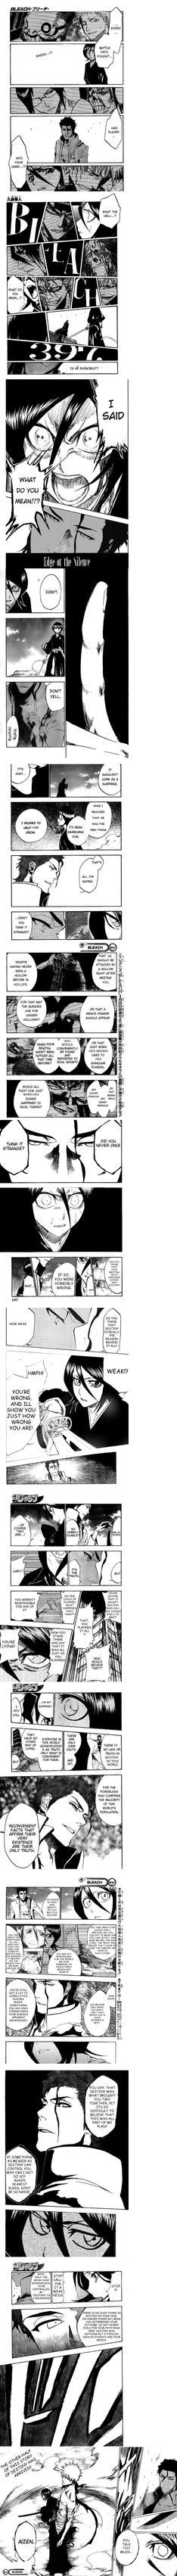 chapter 397 Rukia's version by MariaRuiz122591